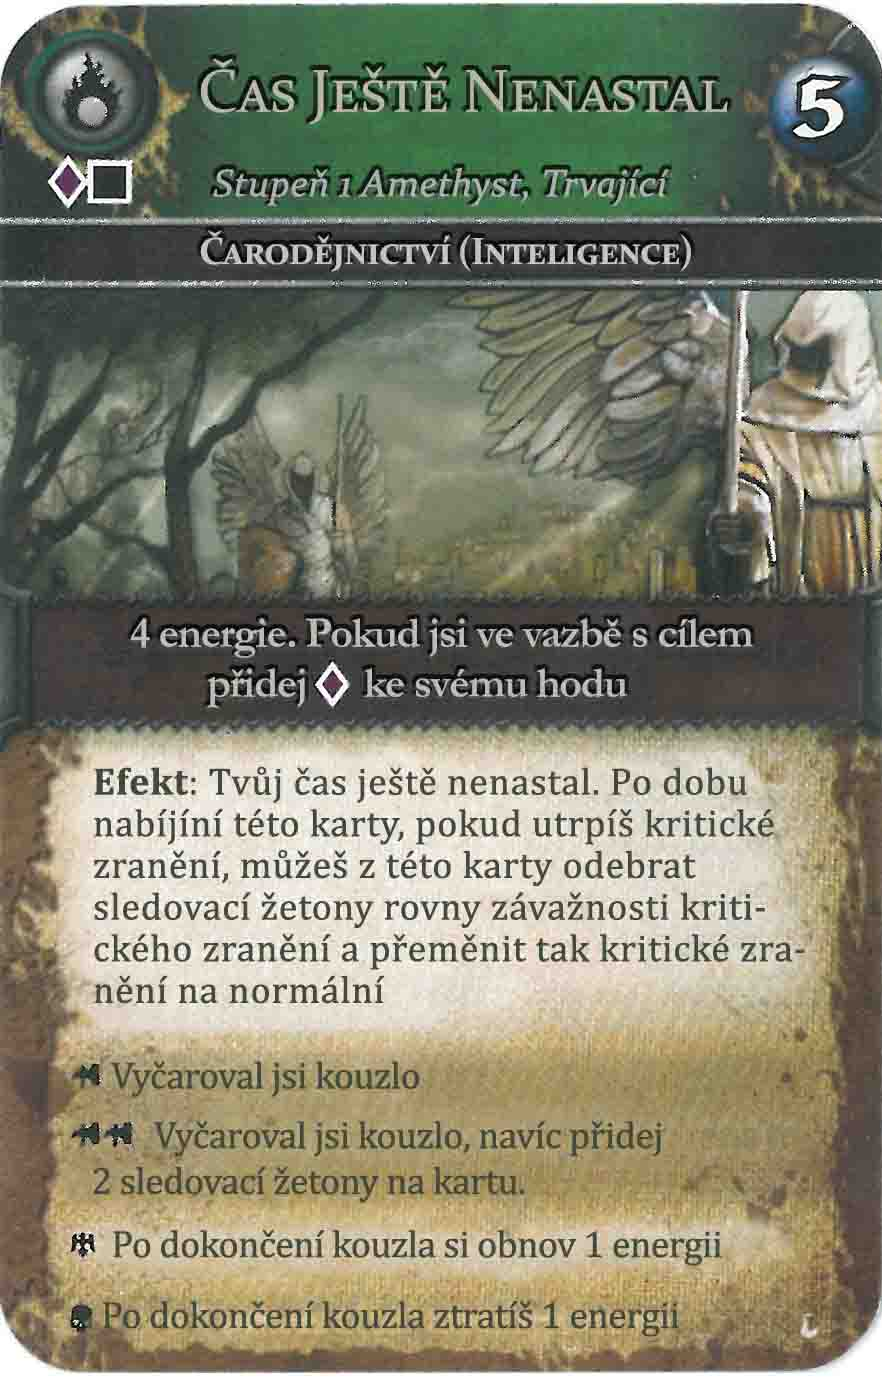 Wizard_-_JesteNenastalCas__zelena_.jpg